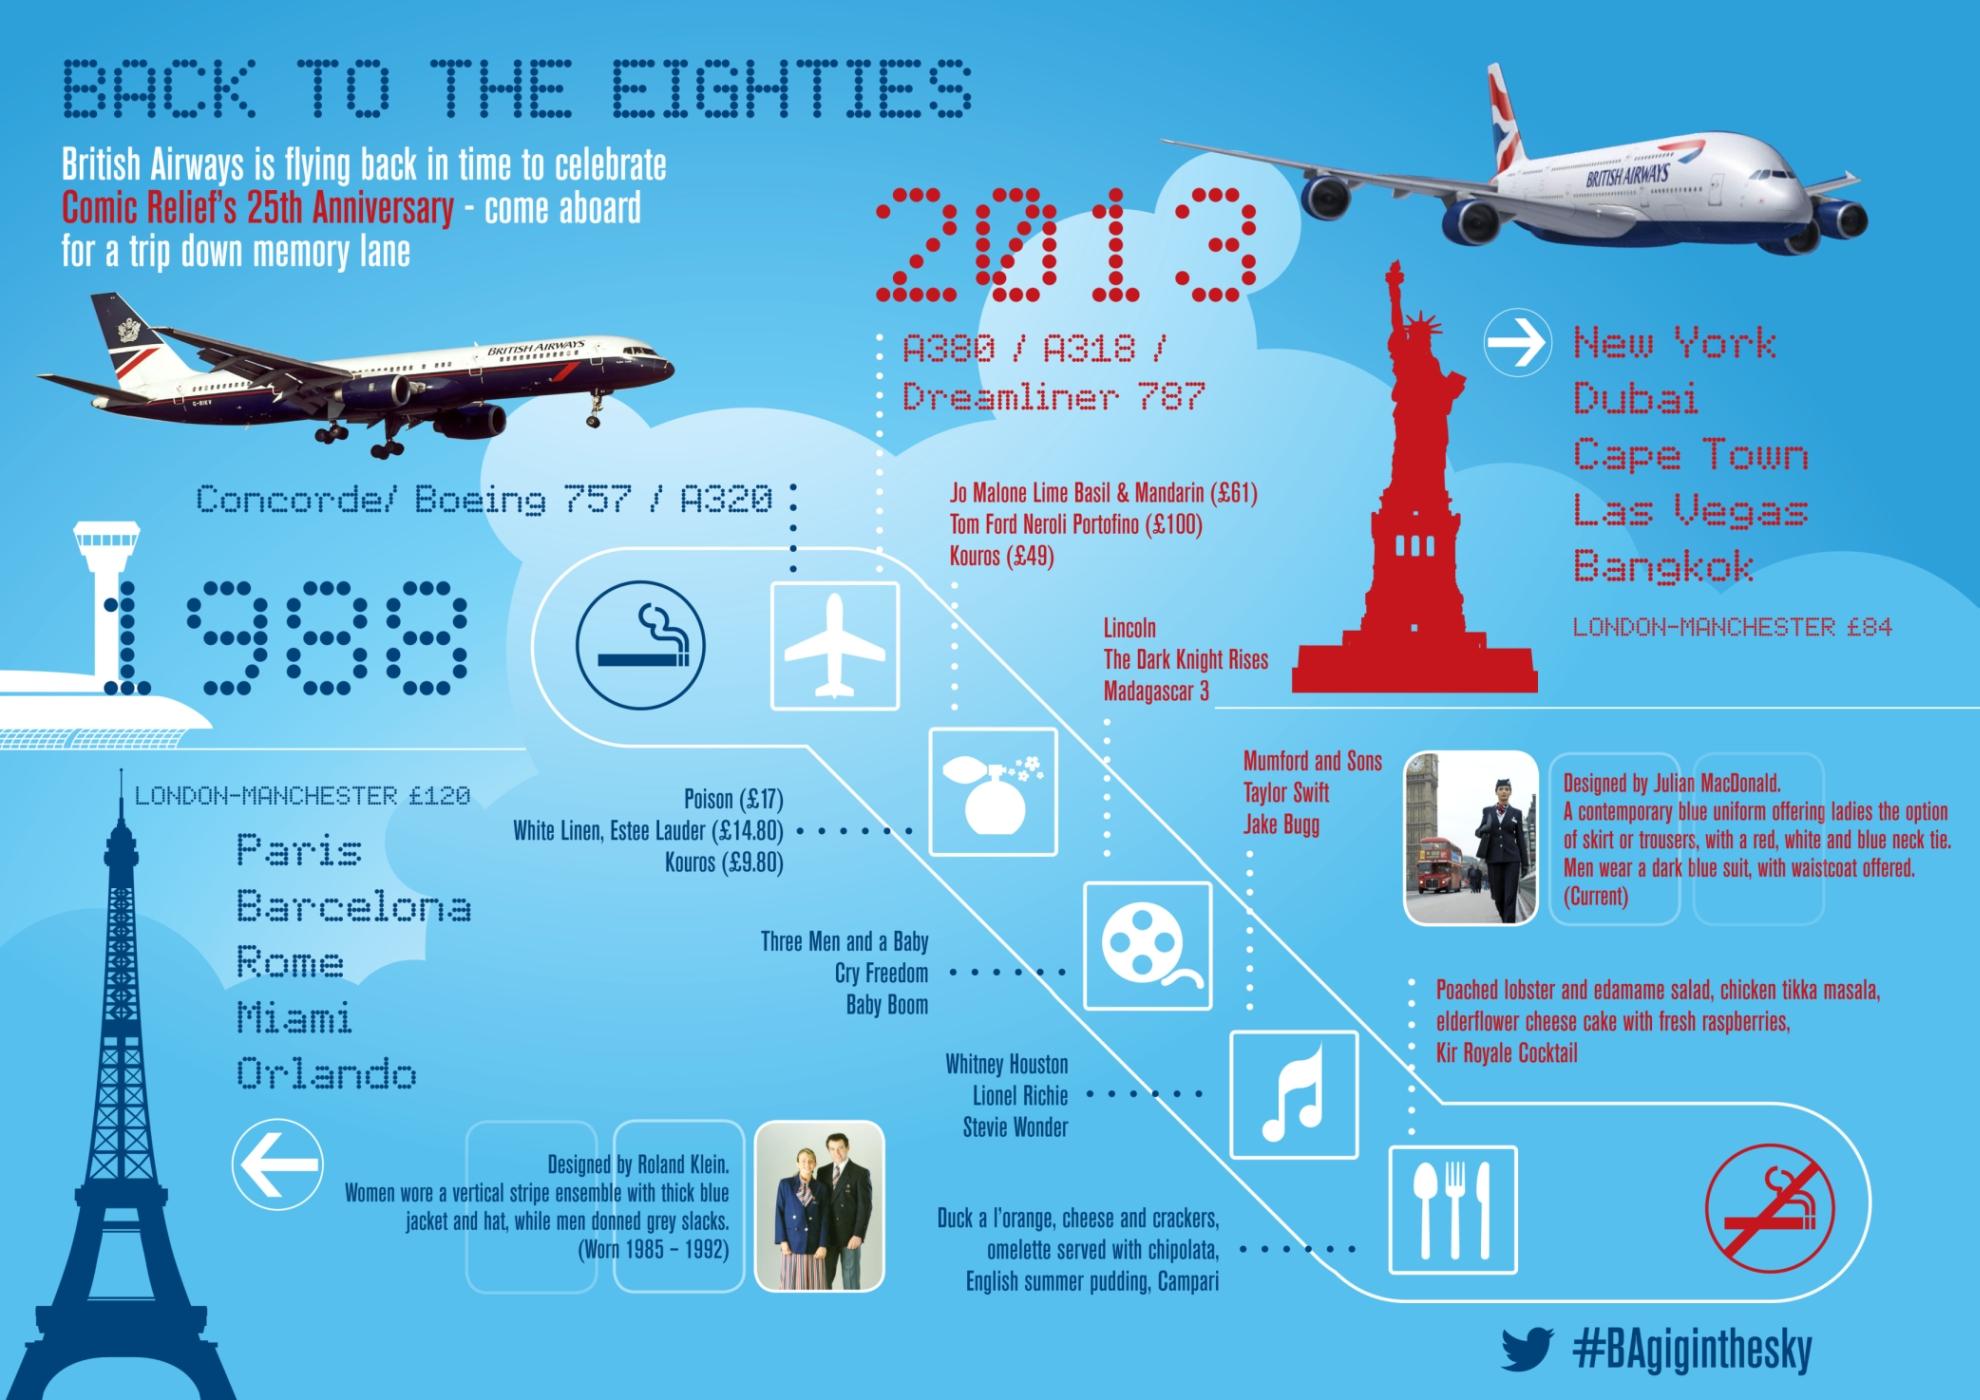 British Airways_1980s_infographic_2013